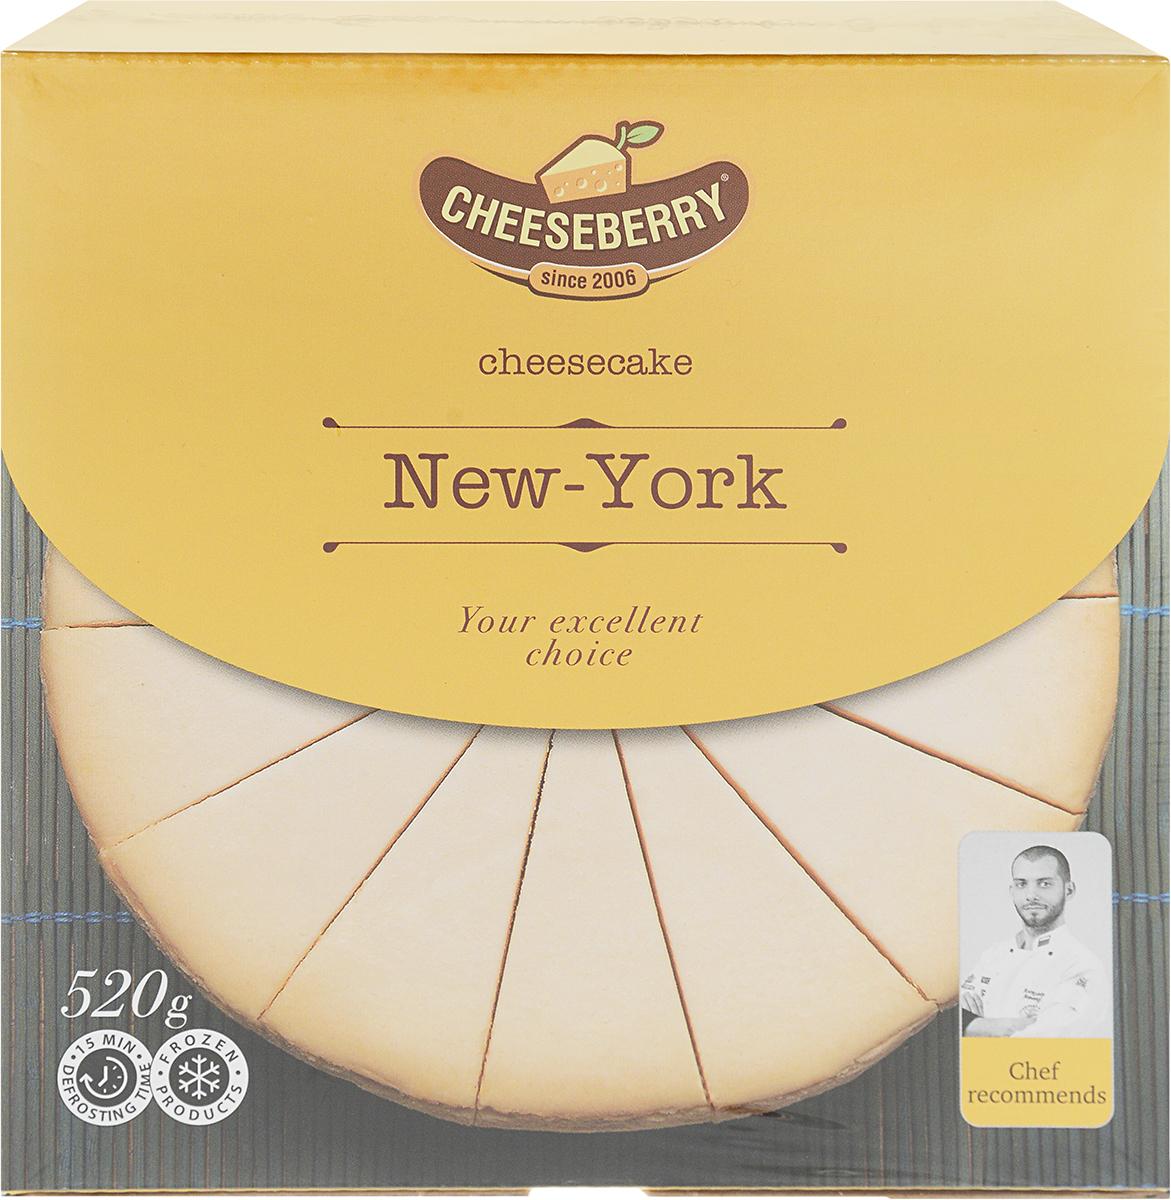 Cheeseberry Чизкейк New-York, 520 г energon protein ванильный чизкейк батончик злаковый 60 г